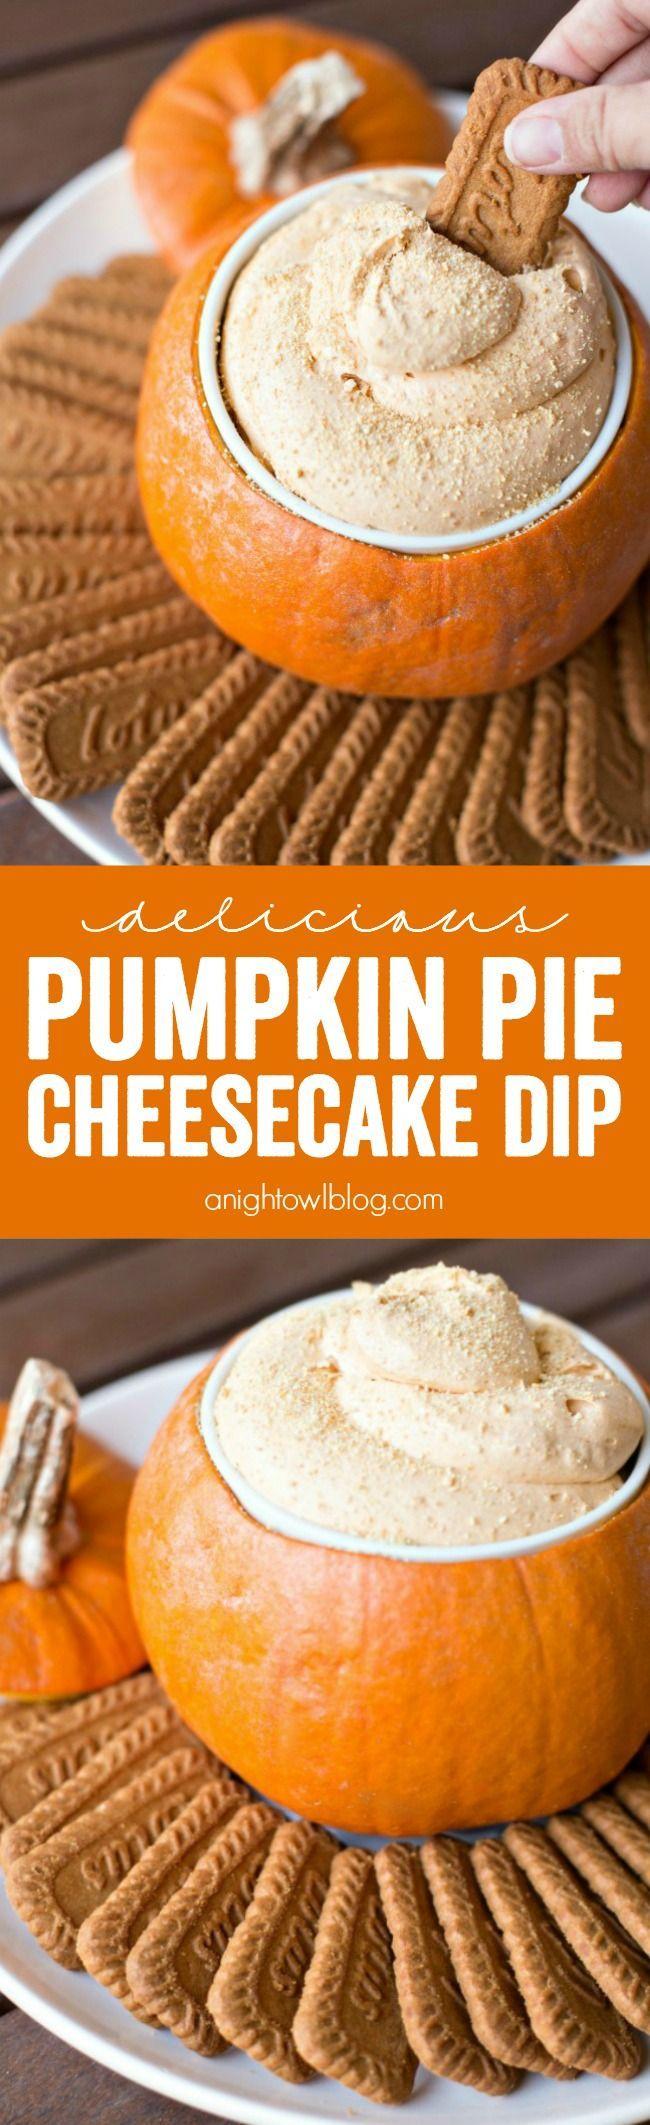 Pumpkin Pie Cheesecake Dip | A Night Owl Blog